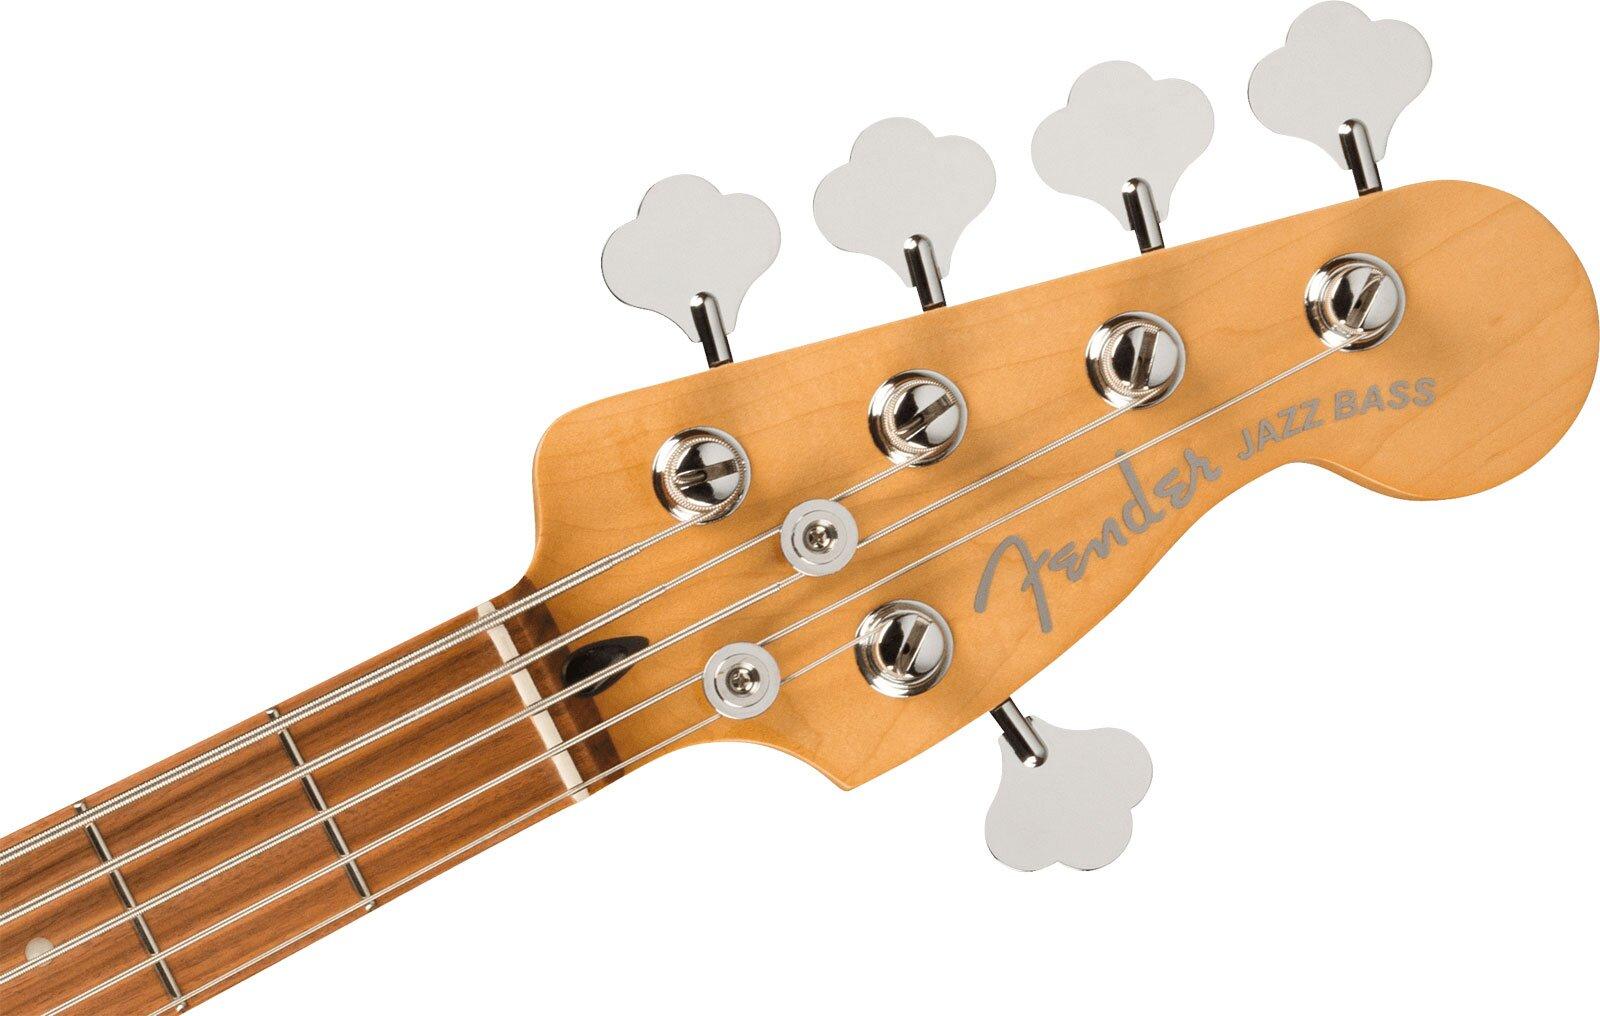 Fender Player Plus Jazz Bass V Pau Ferro Fingerboard Tequila Sunrise : photo 4